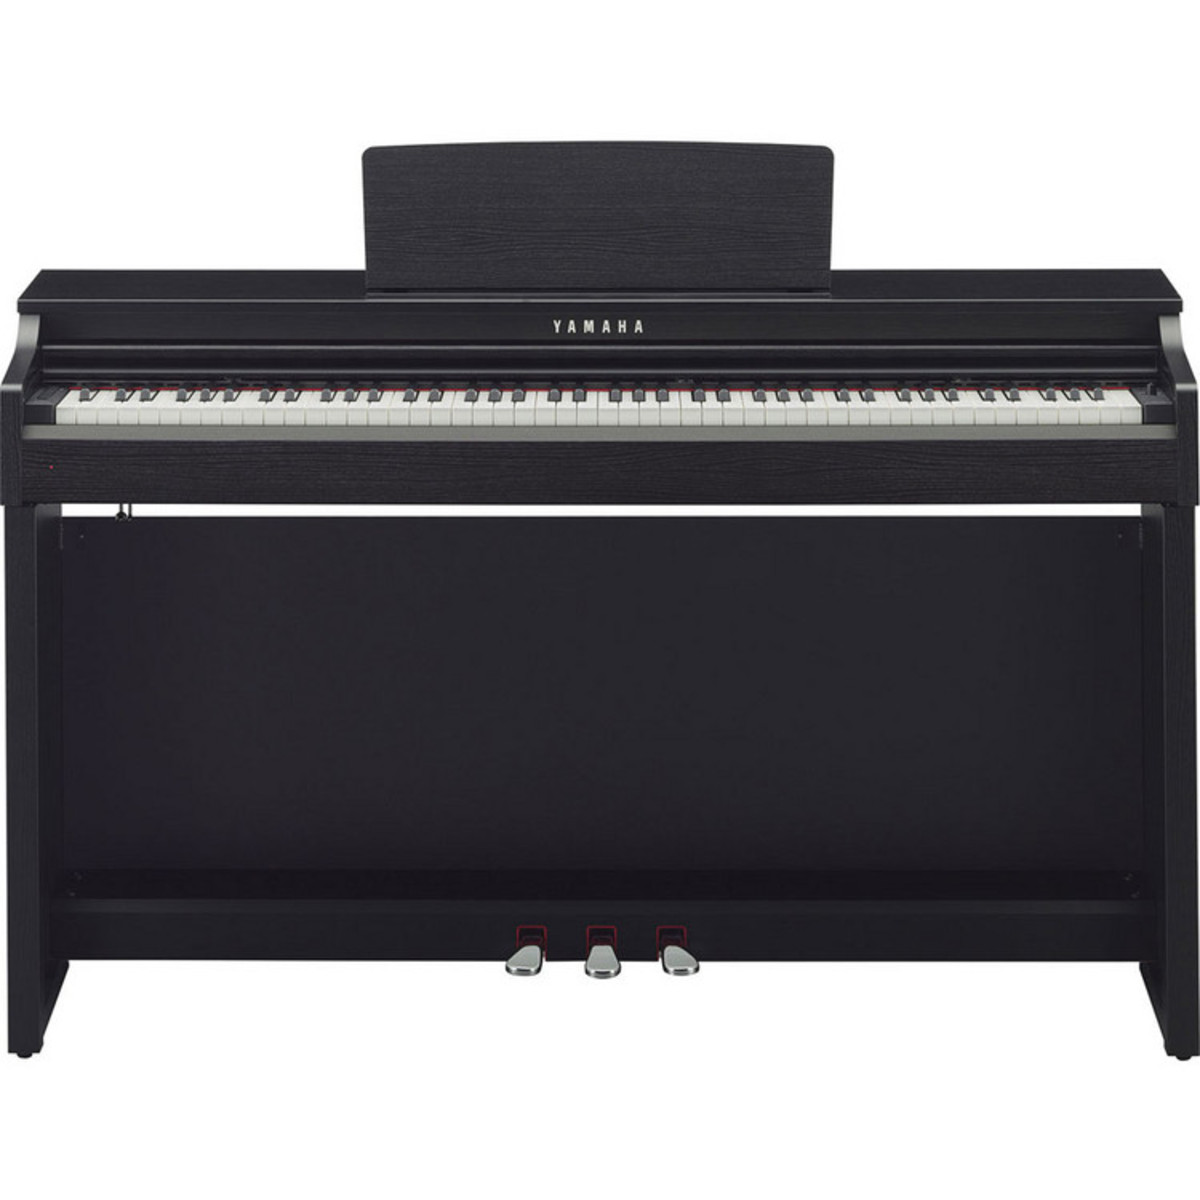 Yamaha clavinova clp525 digital piano black walnut ex for Yamaha digital piano clavinova